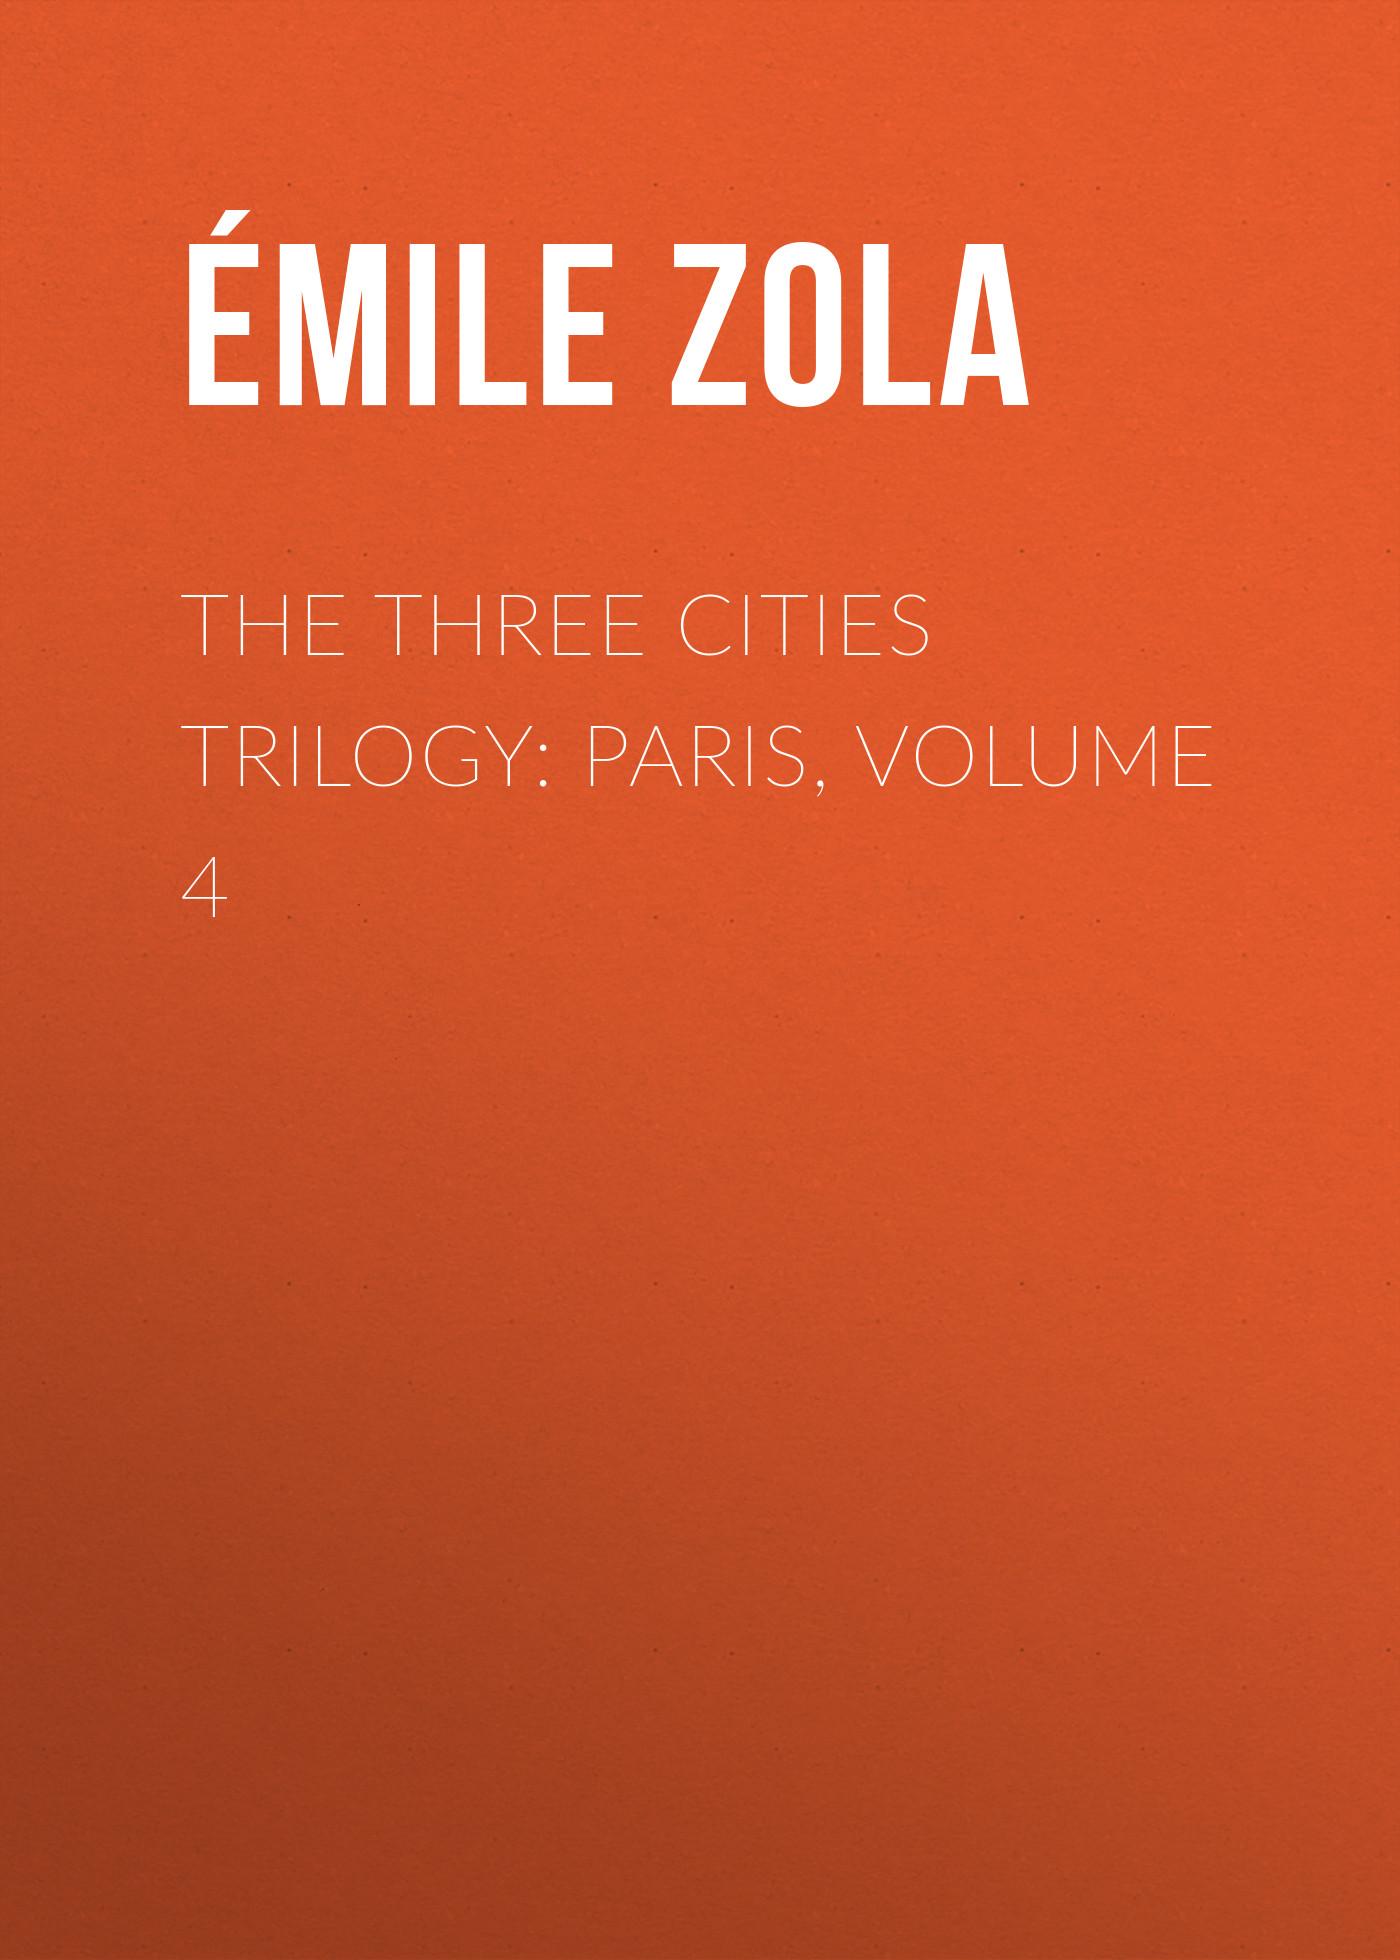 Эмиль Золя The Three Cities Trilogy: Paris, Volume 4 эмиль золя the three cities trilogy rome volume 5